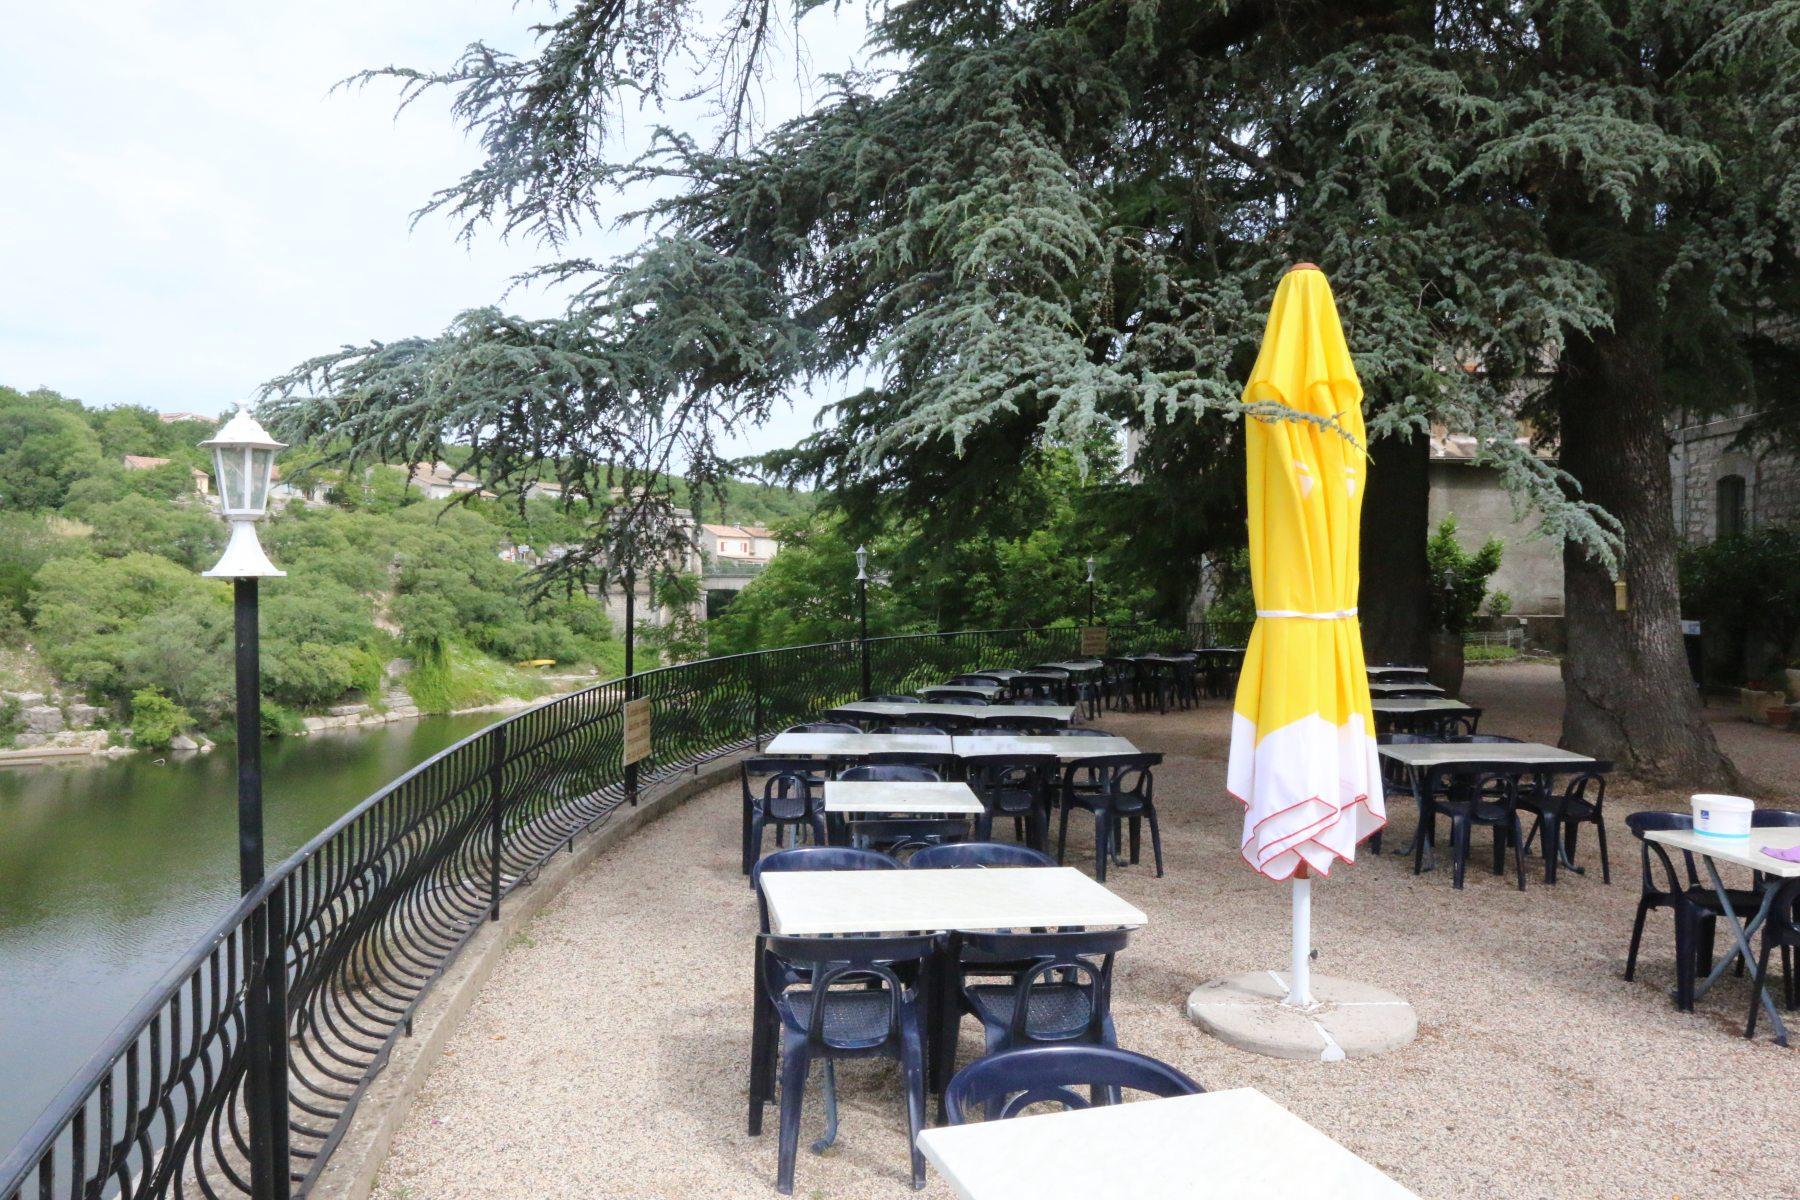 Les Terrasses de l'Ardèche